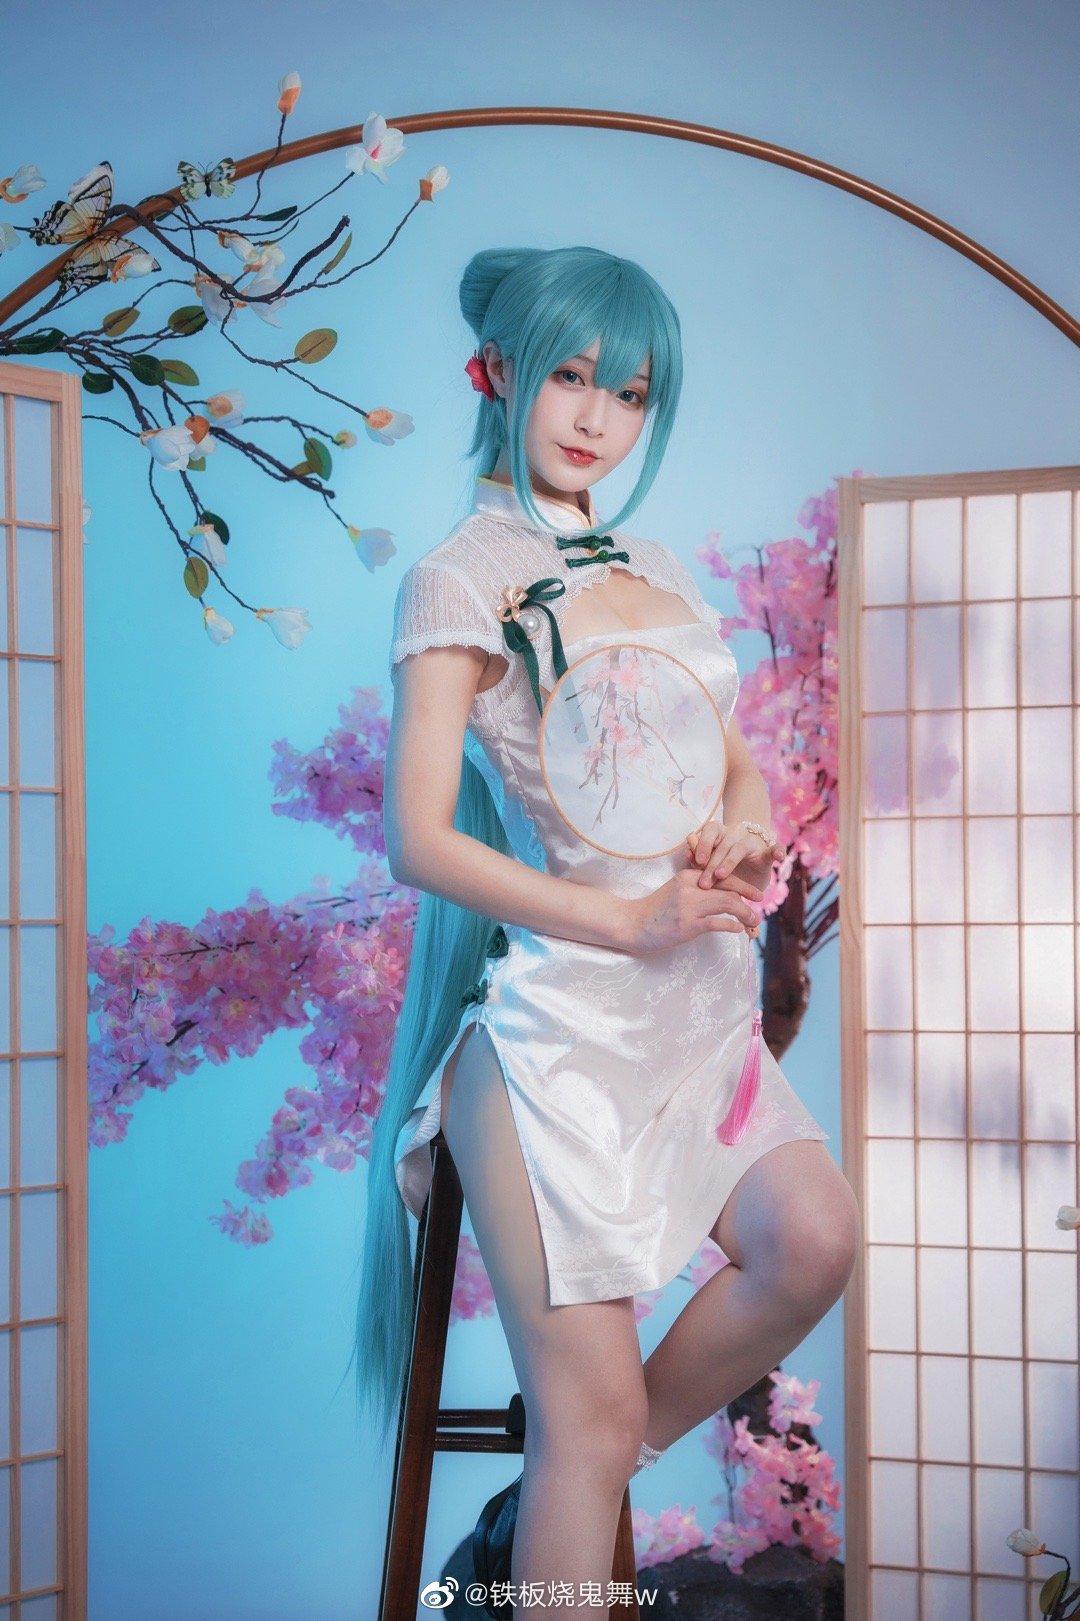 [COS]初音未来   韶华   @铁板烧鬼舞w (9P) -cosplay图片素材免费下载插图